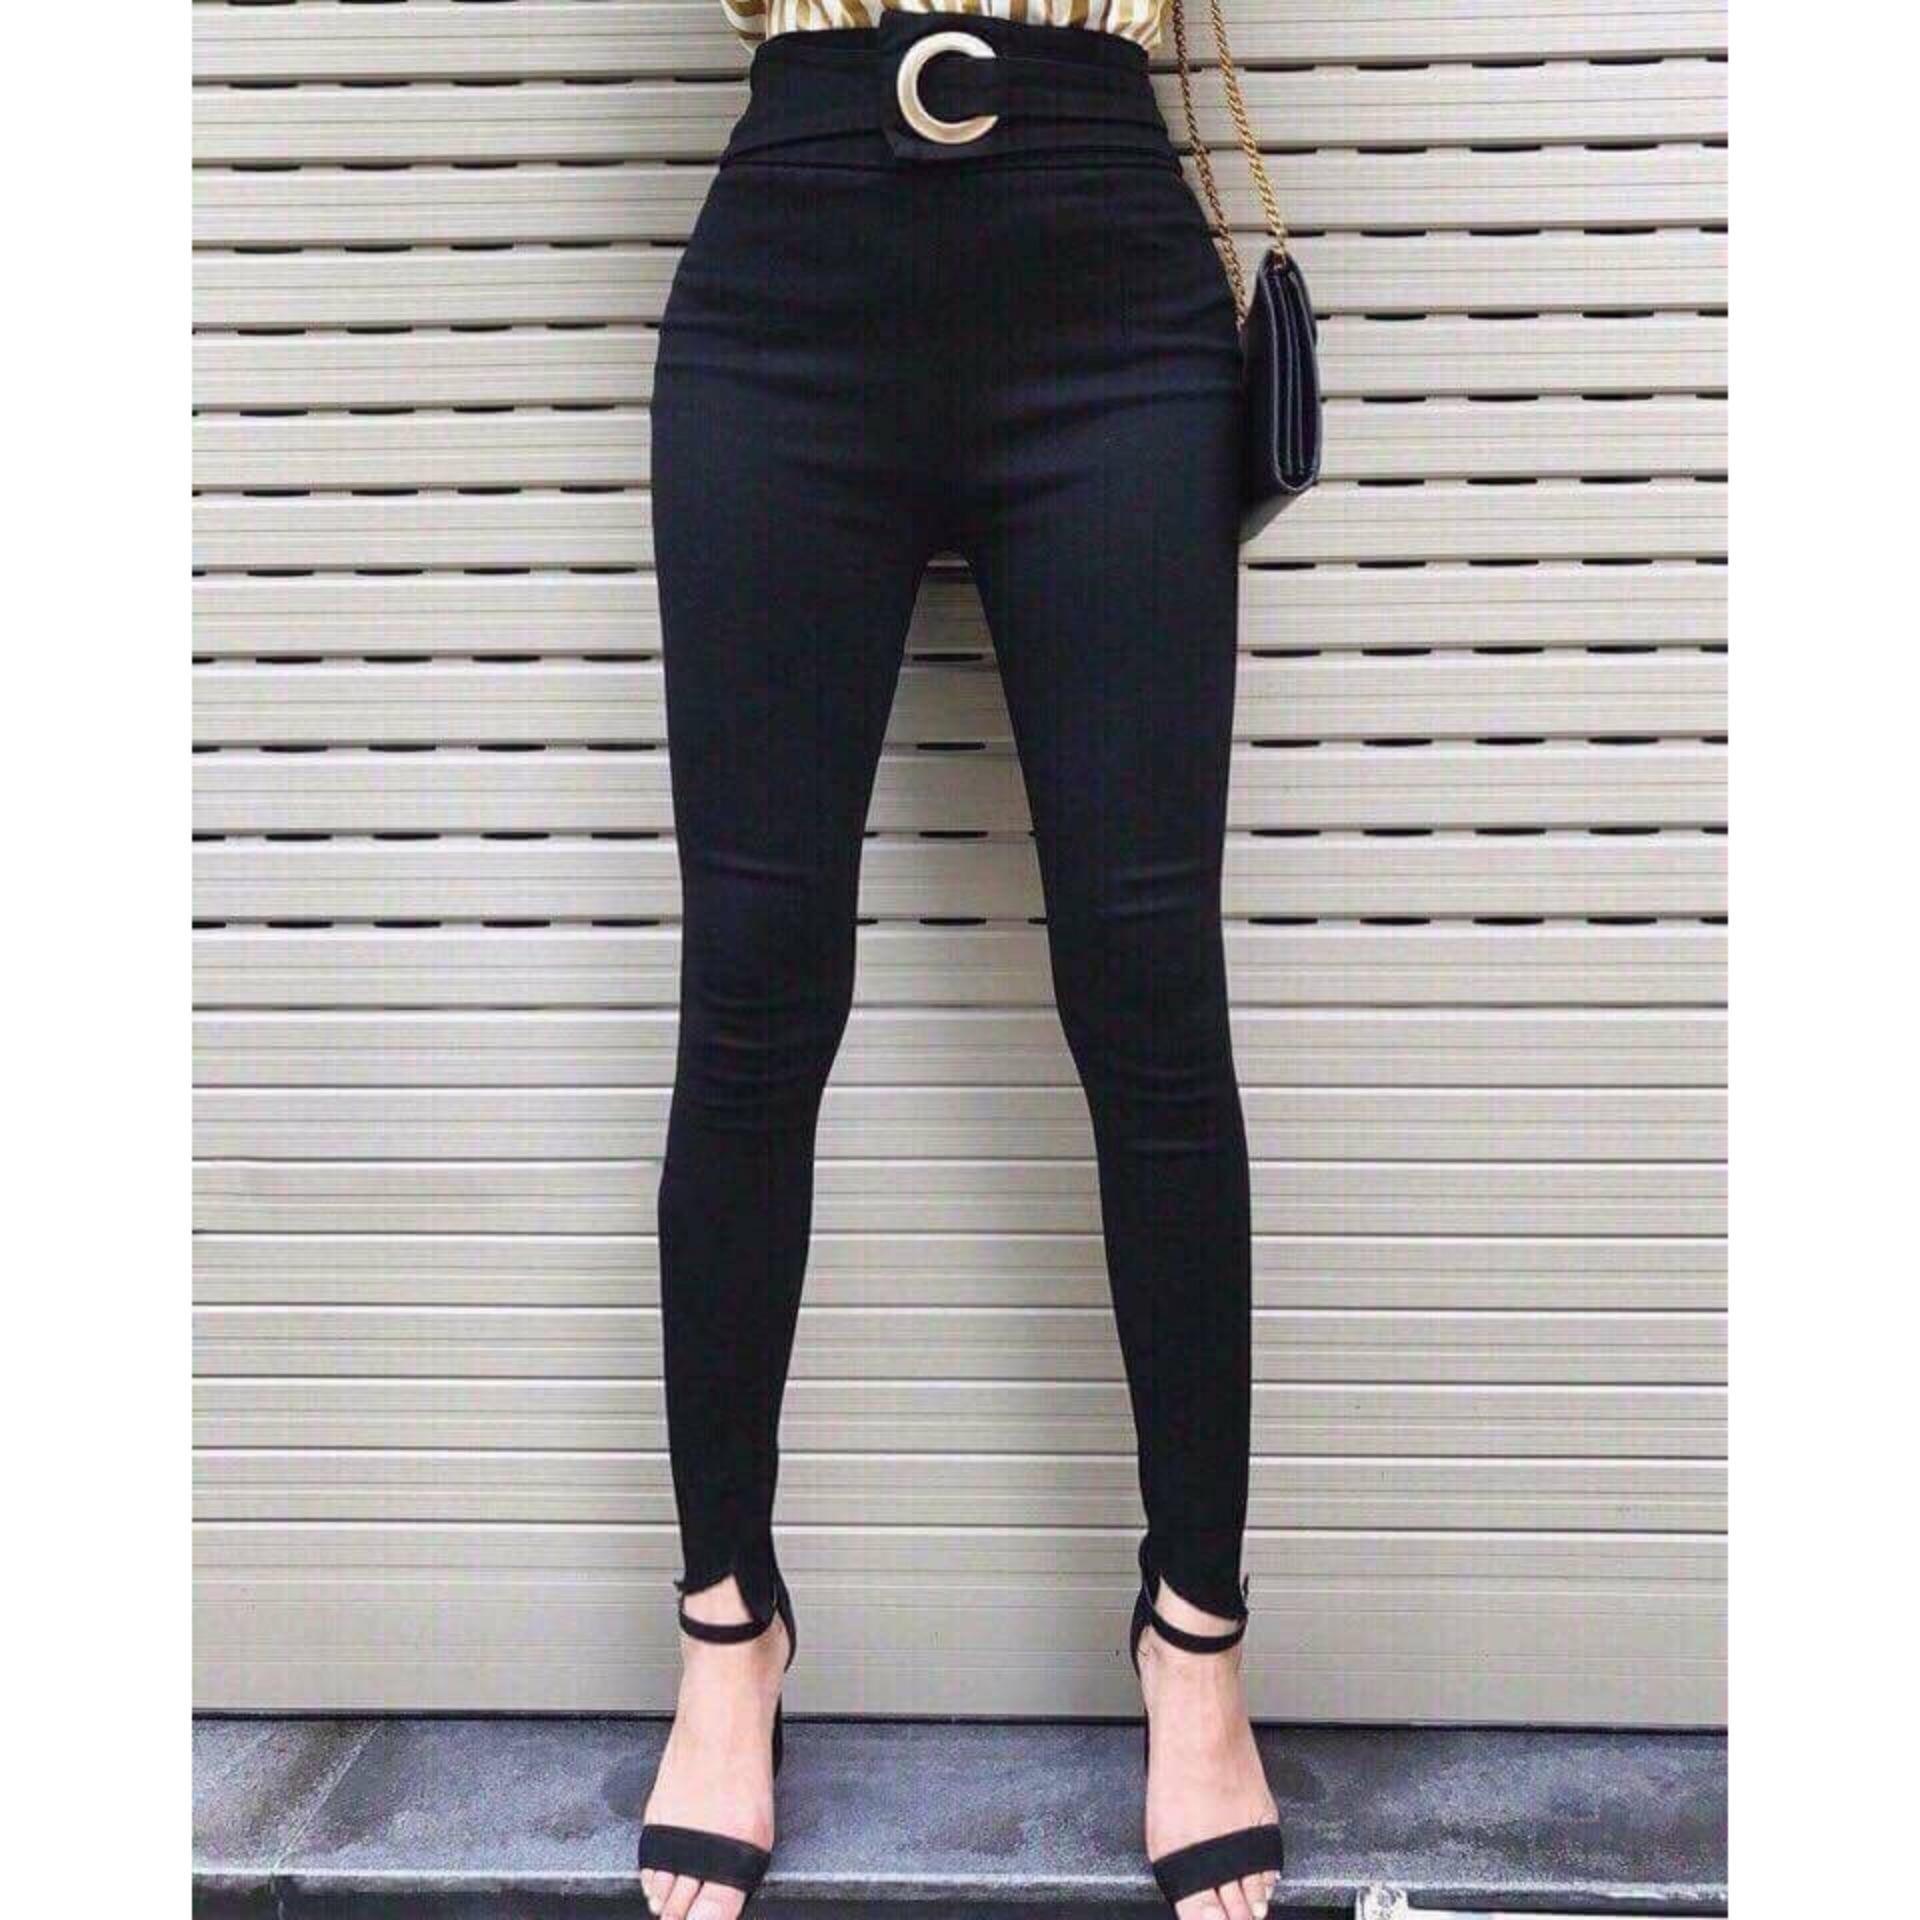 Quần kaki lưng cao gắn khoen hàng thiết kế cao cấp